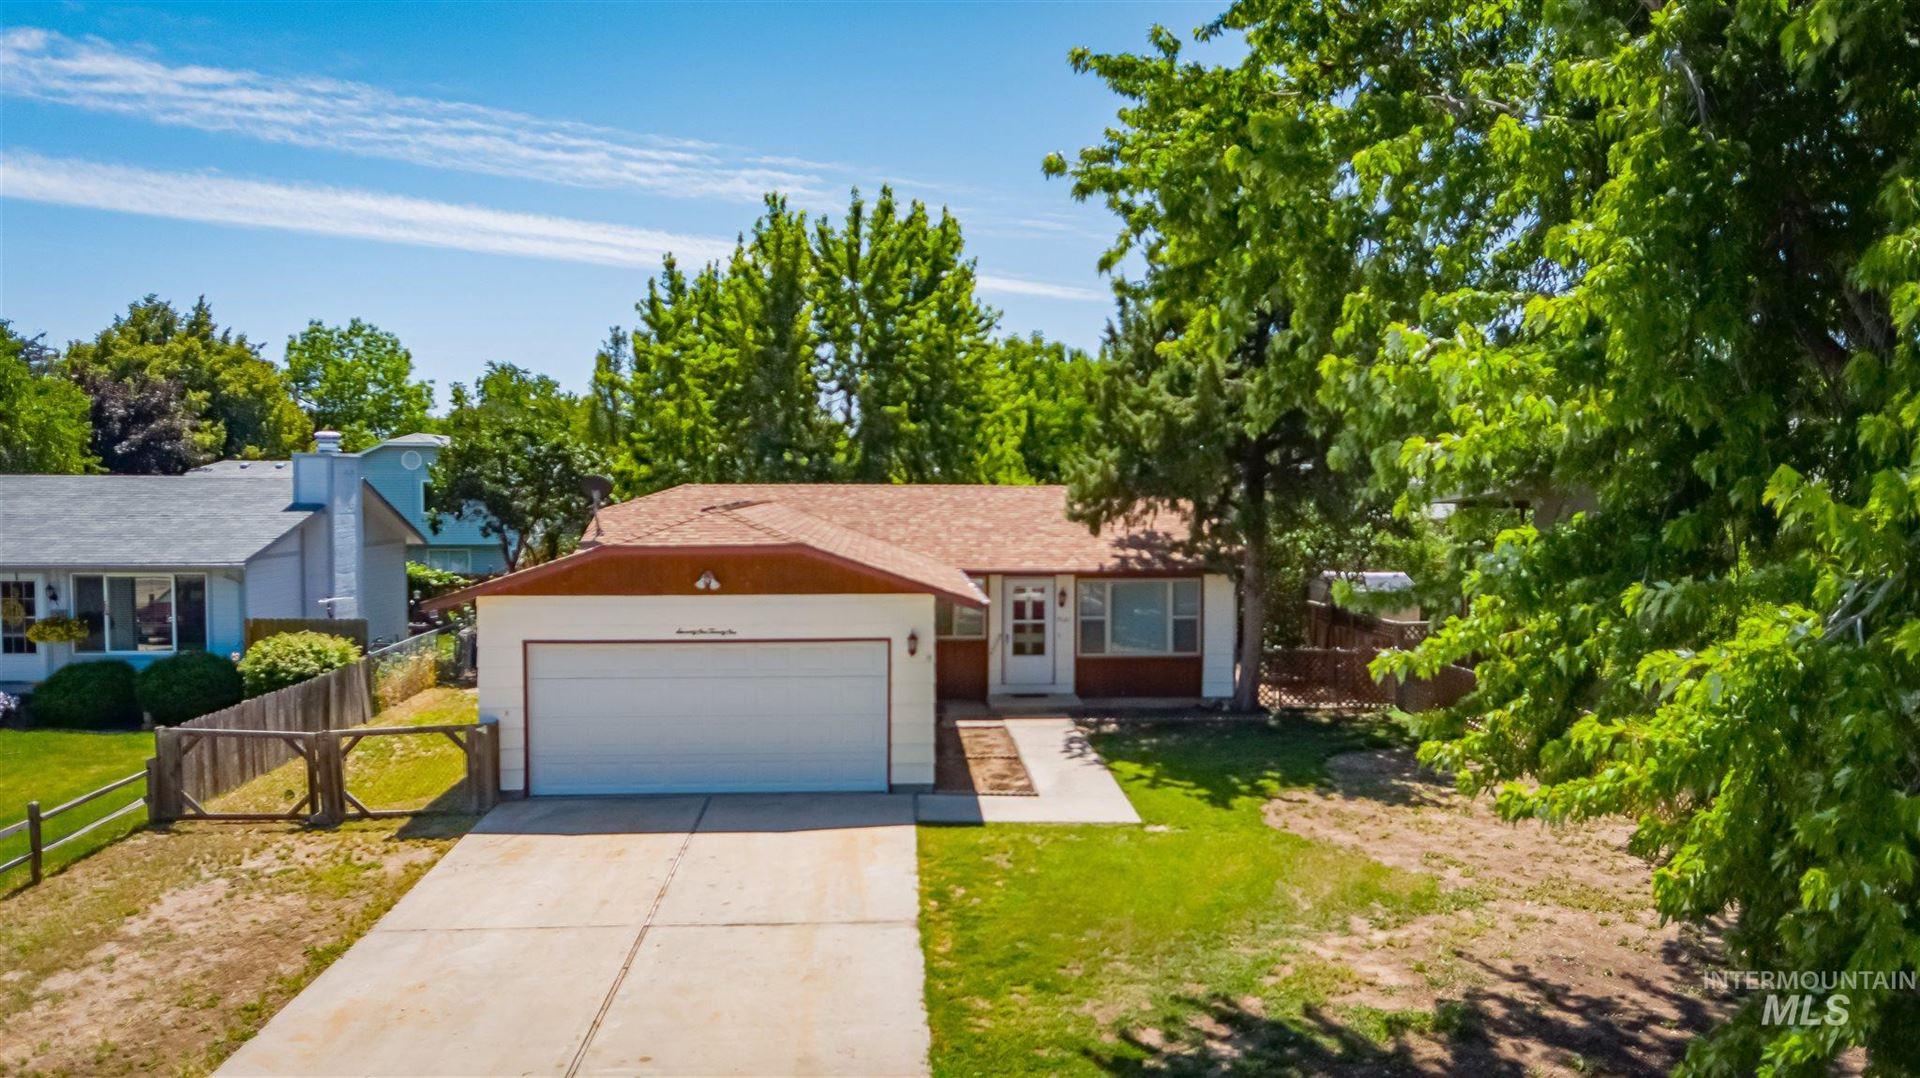 7121 W Poplar St, Boise, ID 83704 - MLS#: 98773155